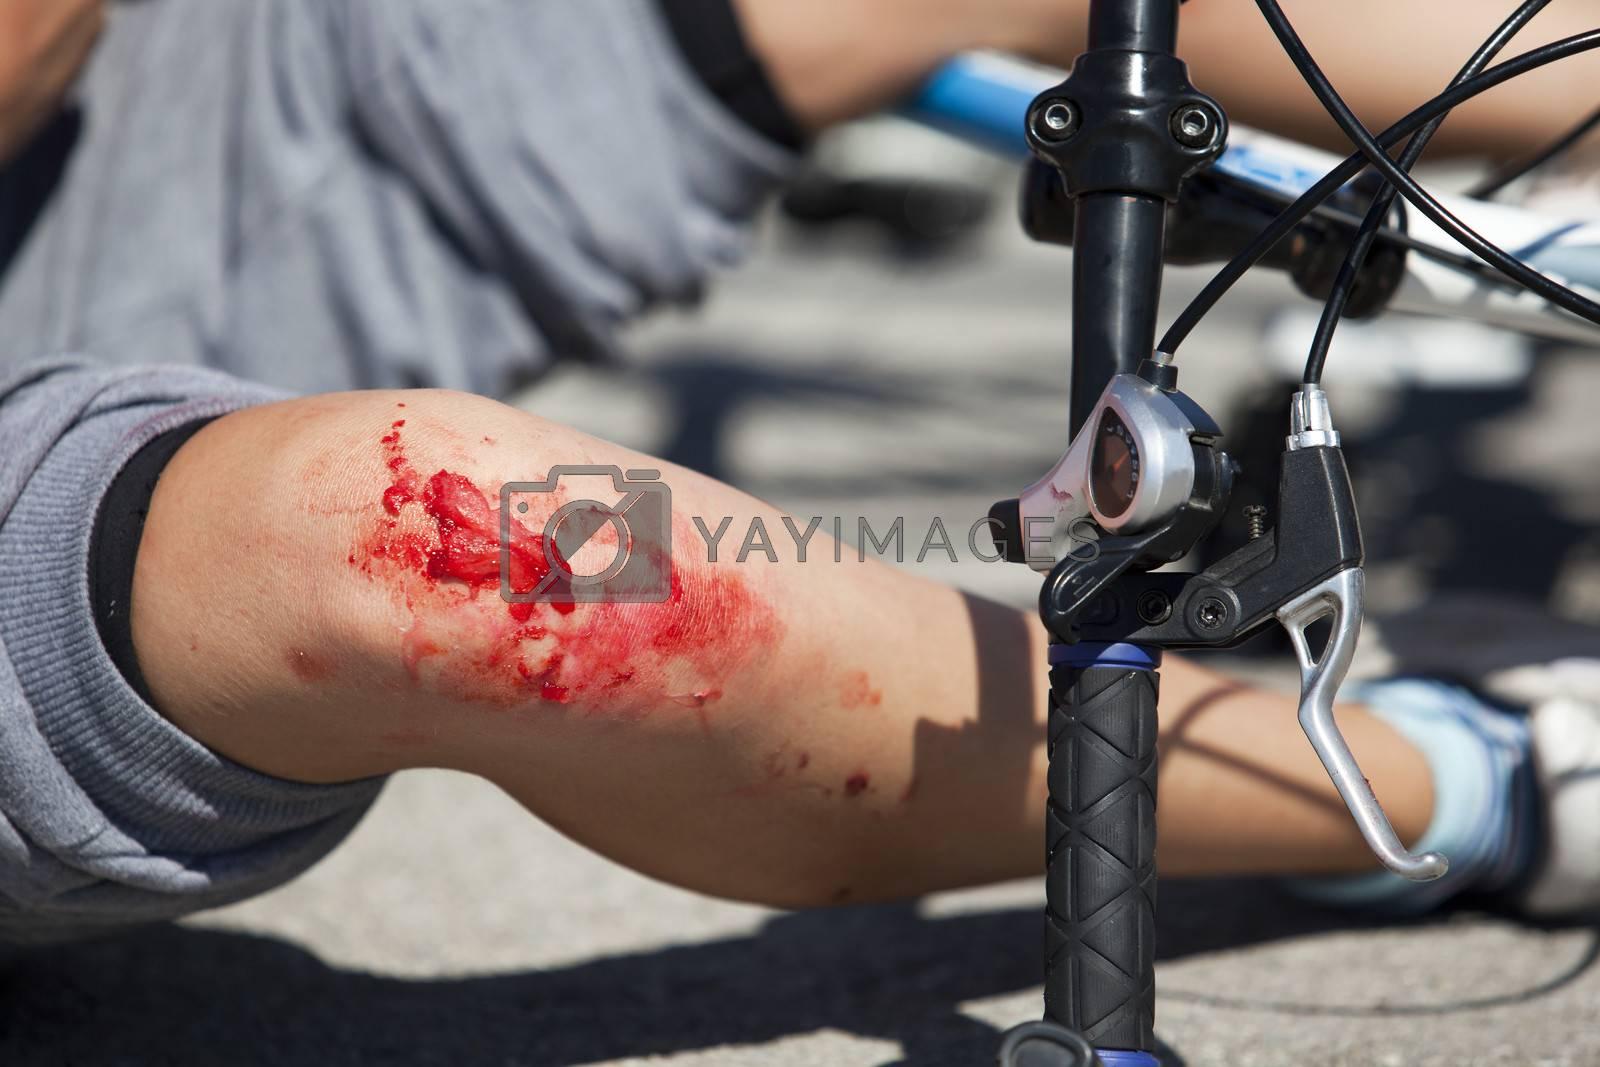 Serious injury on boy's legs